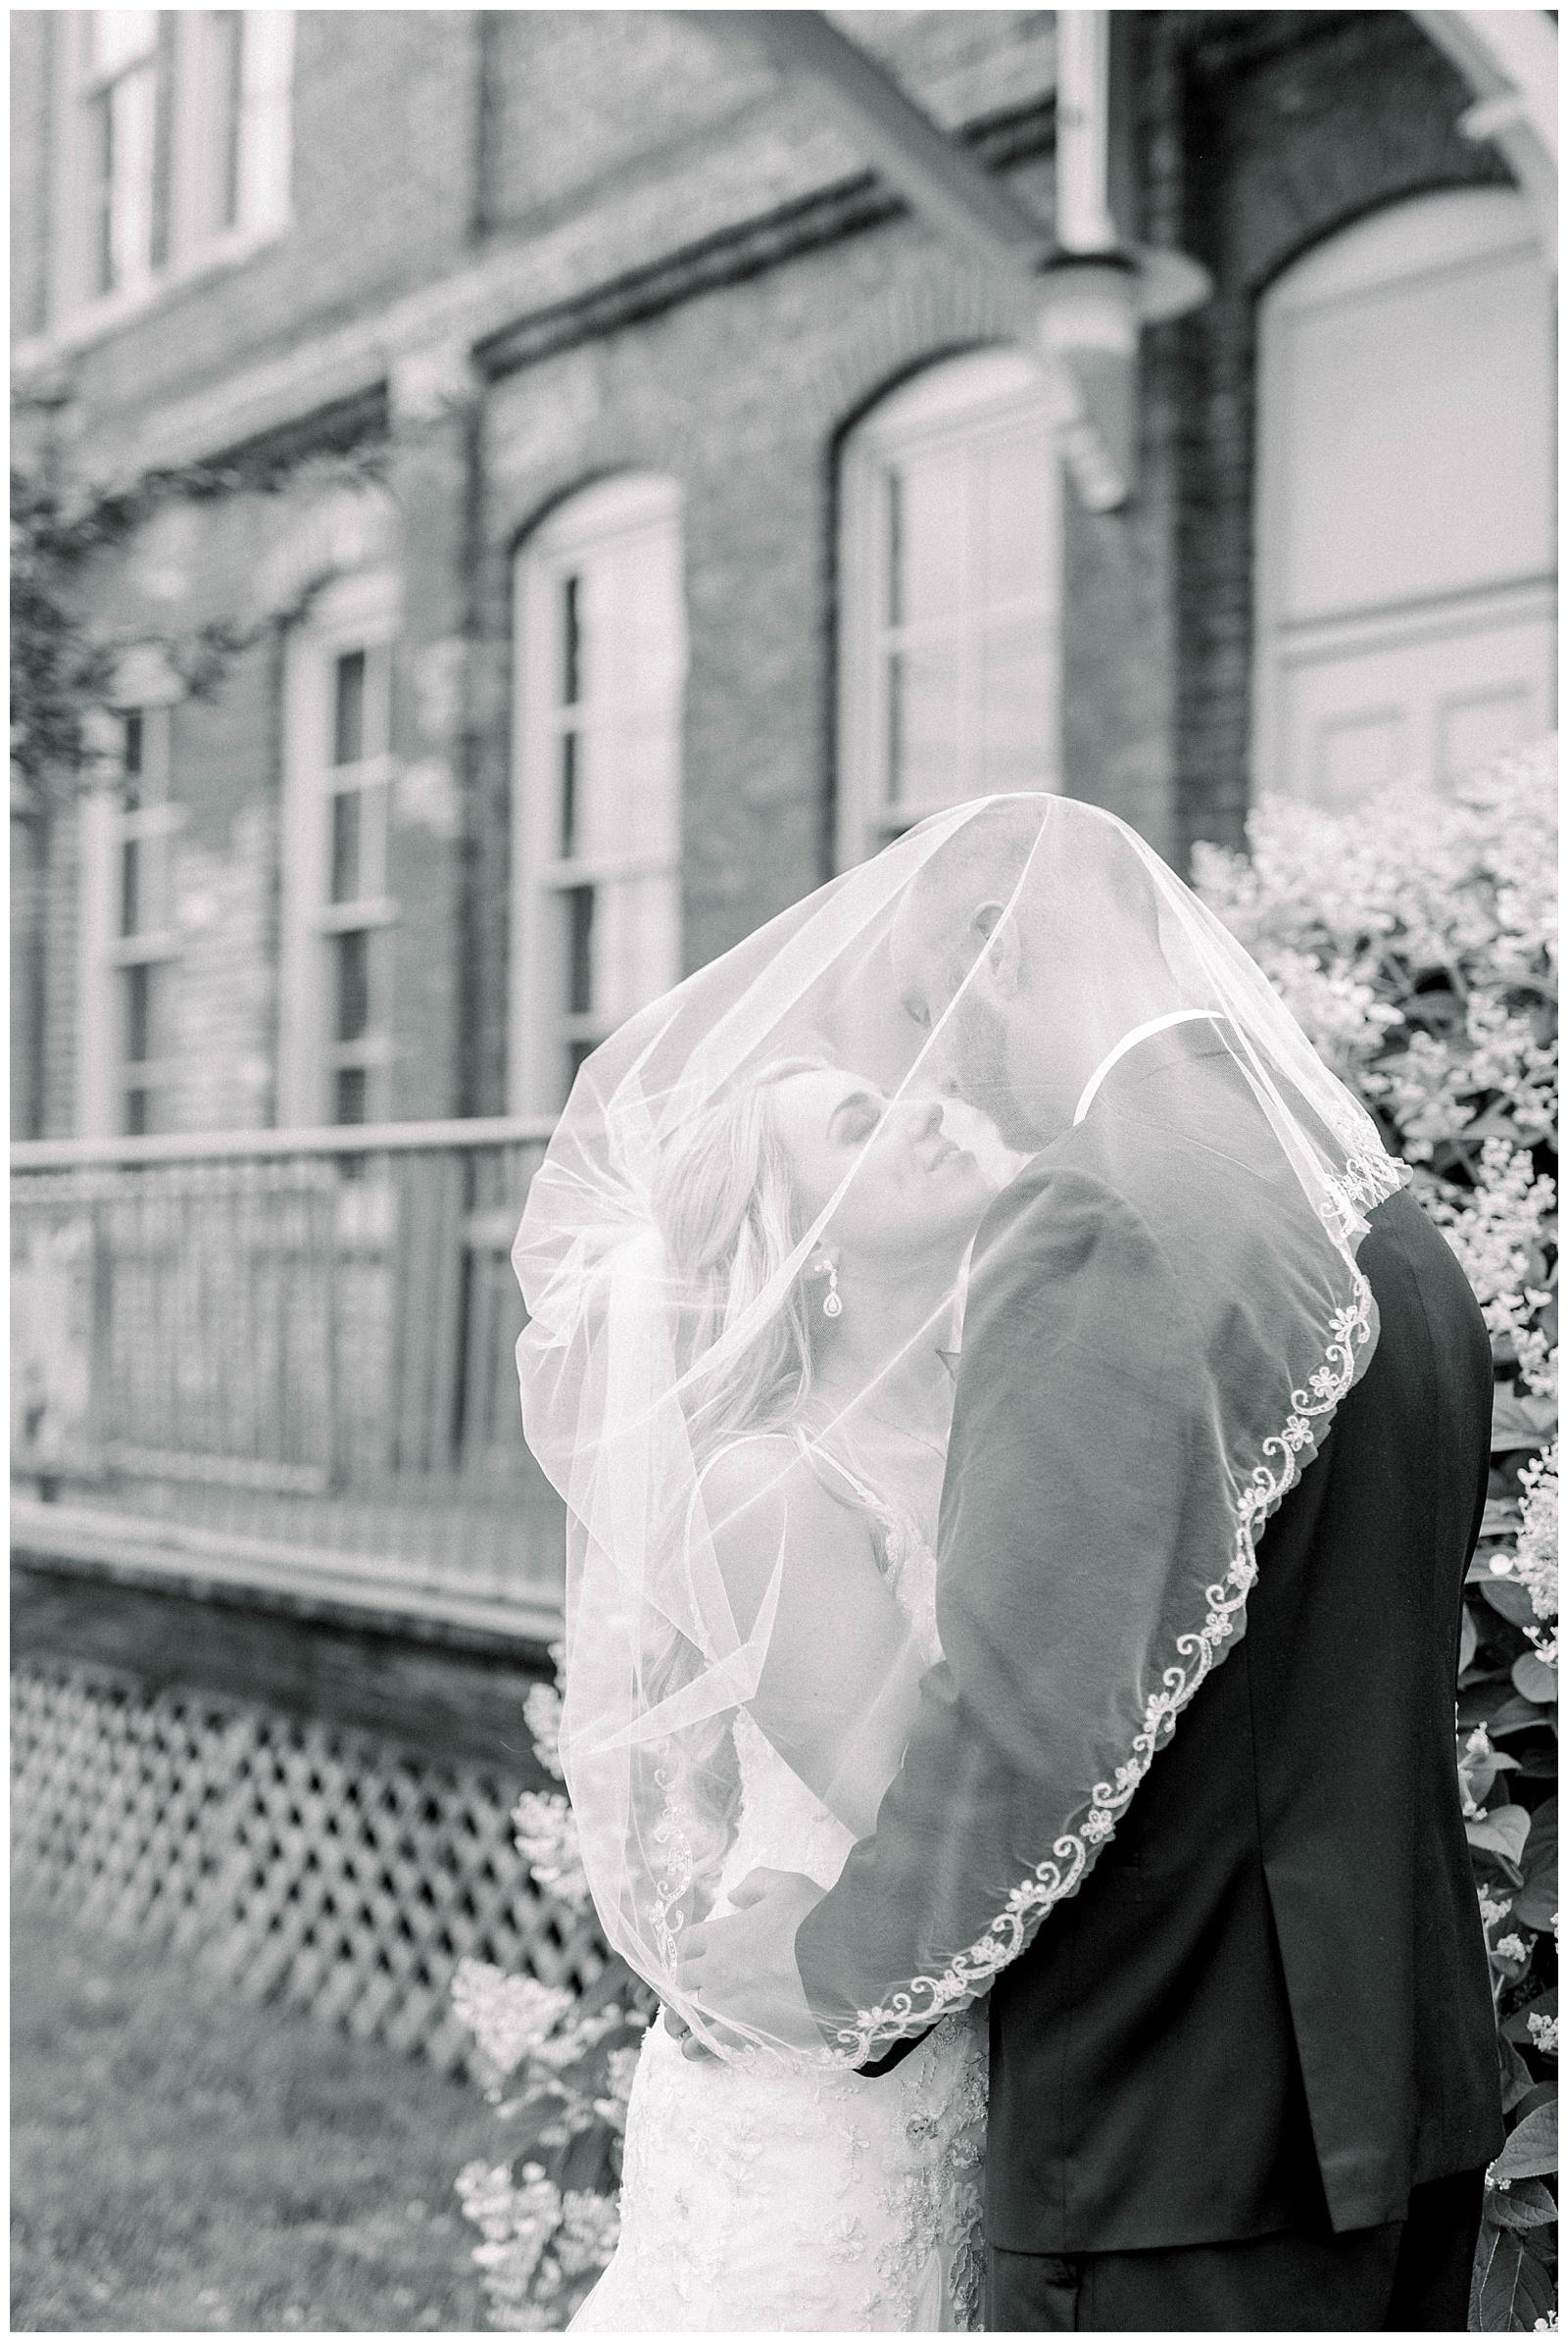 Myers-Kara-Blakeman-Photography-West-Virginia-Charleston-South-Carolina-Wedding-Photographer.jpg